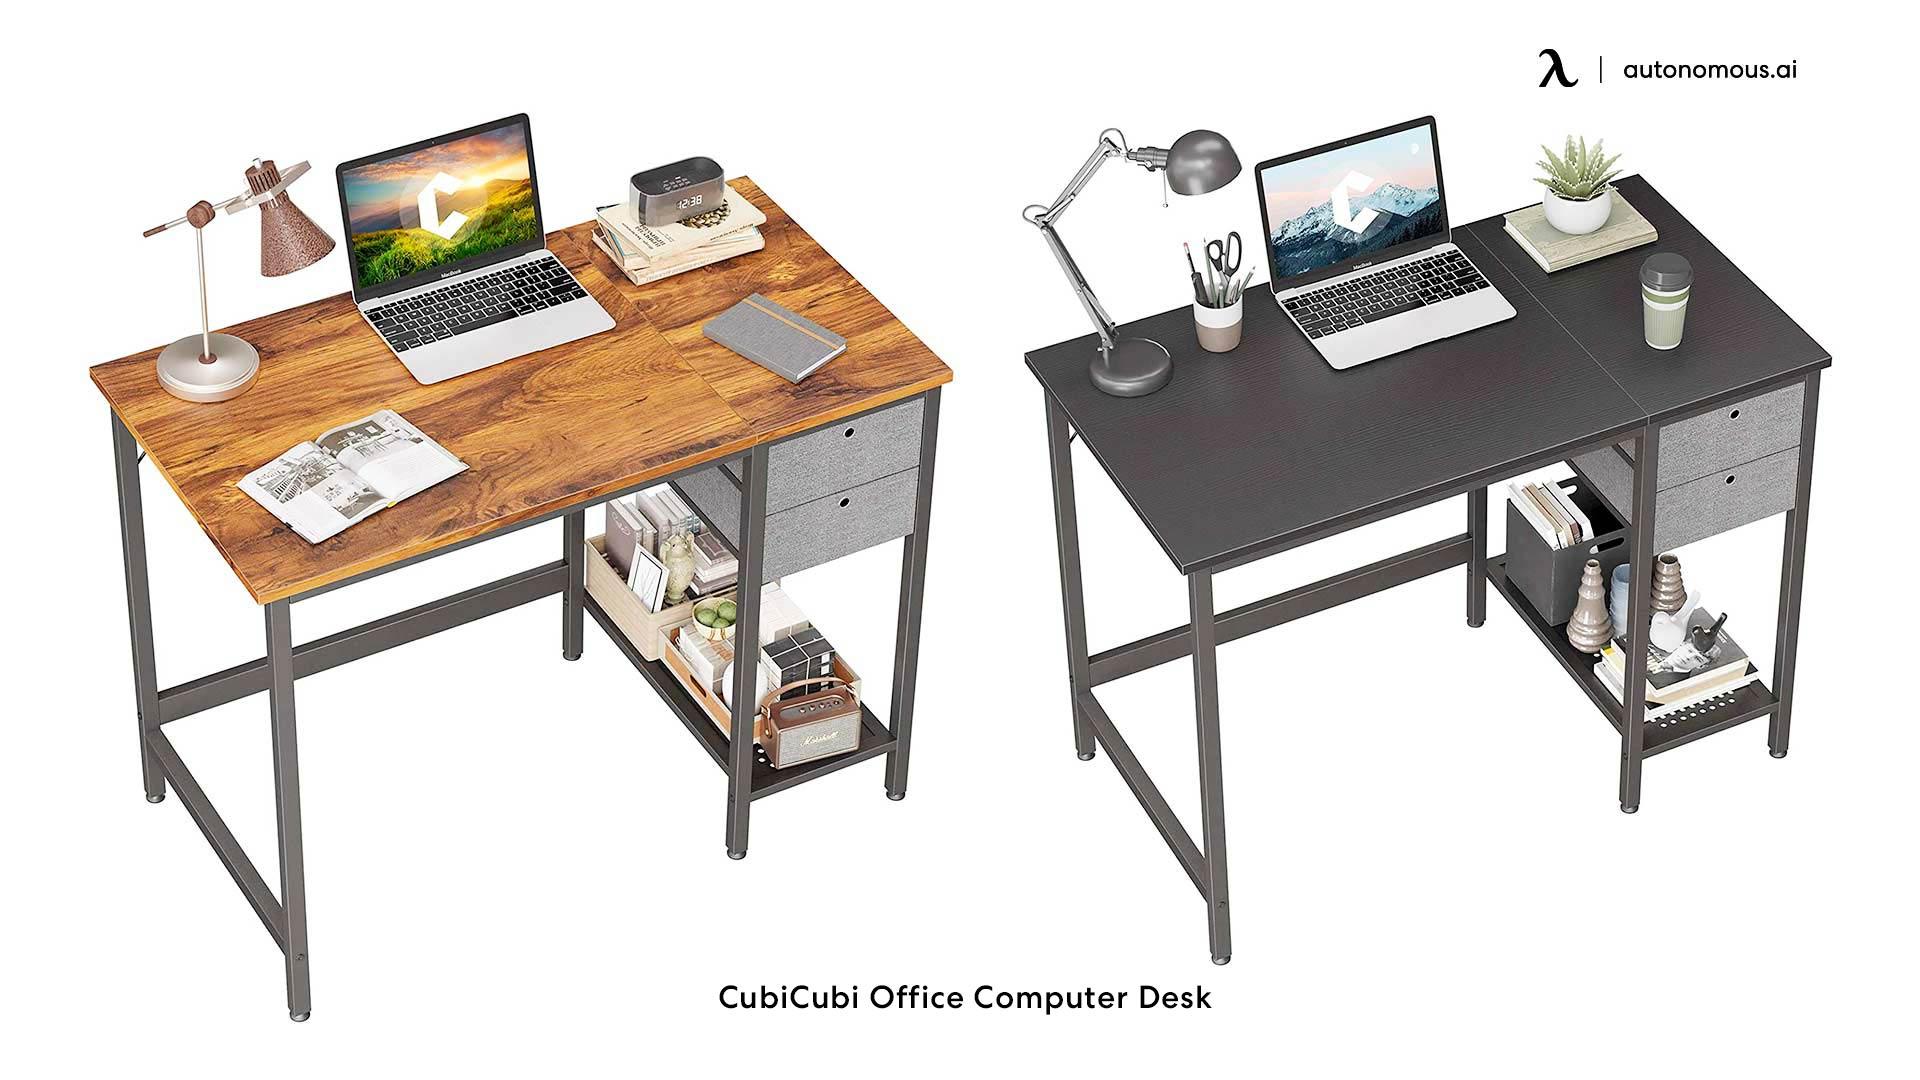 CubiCubi Office Computer Desk